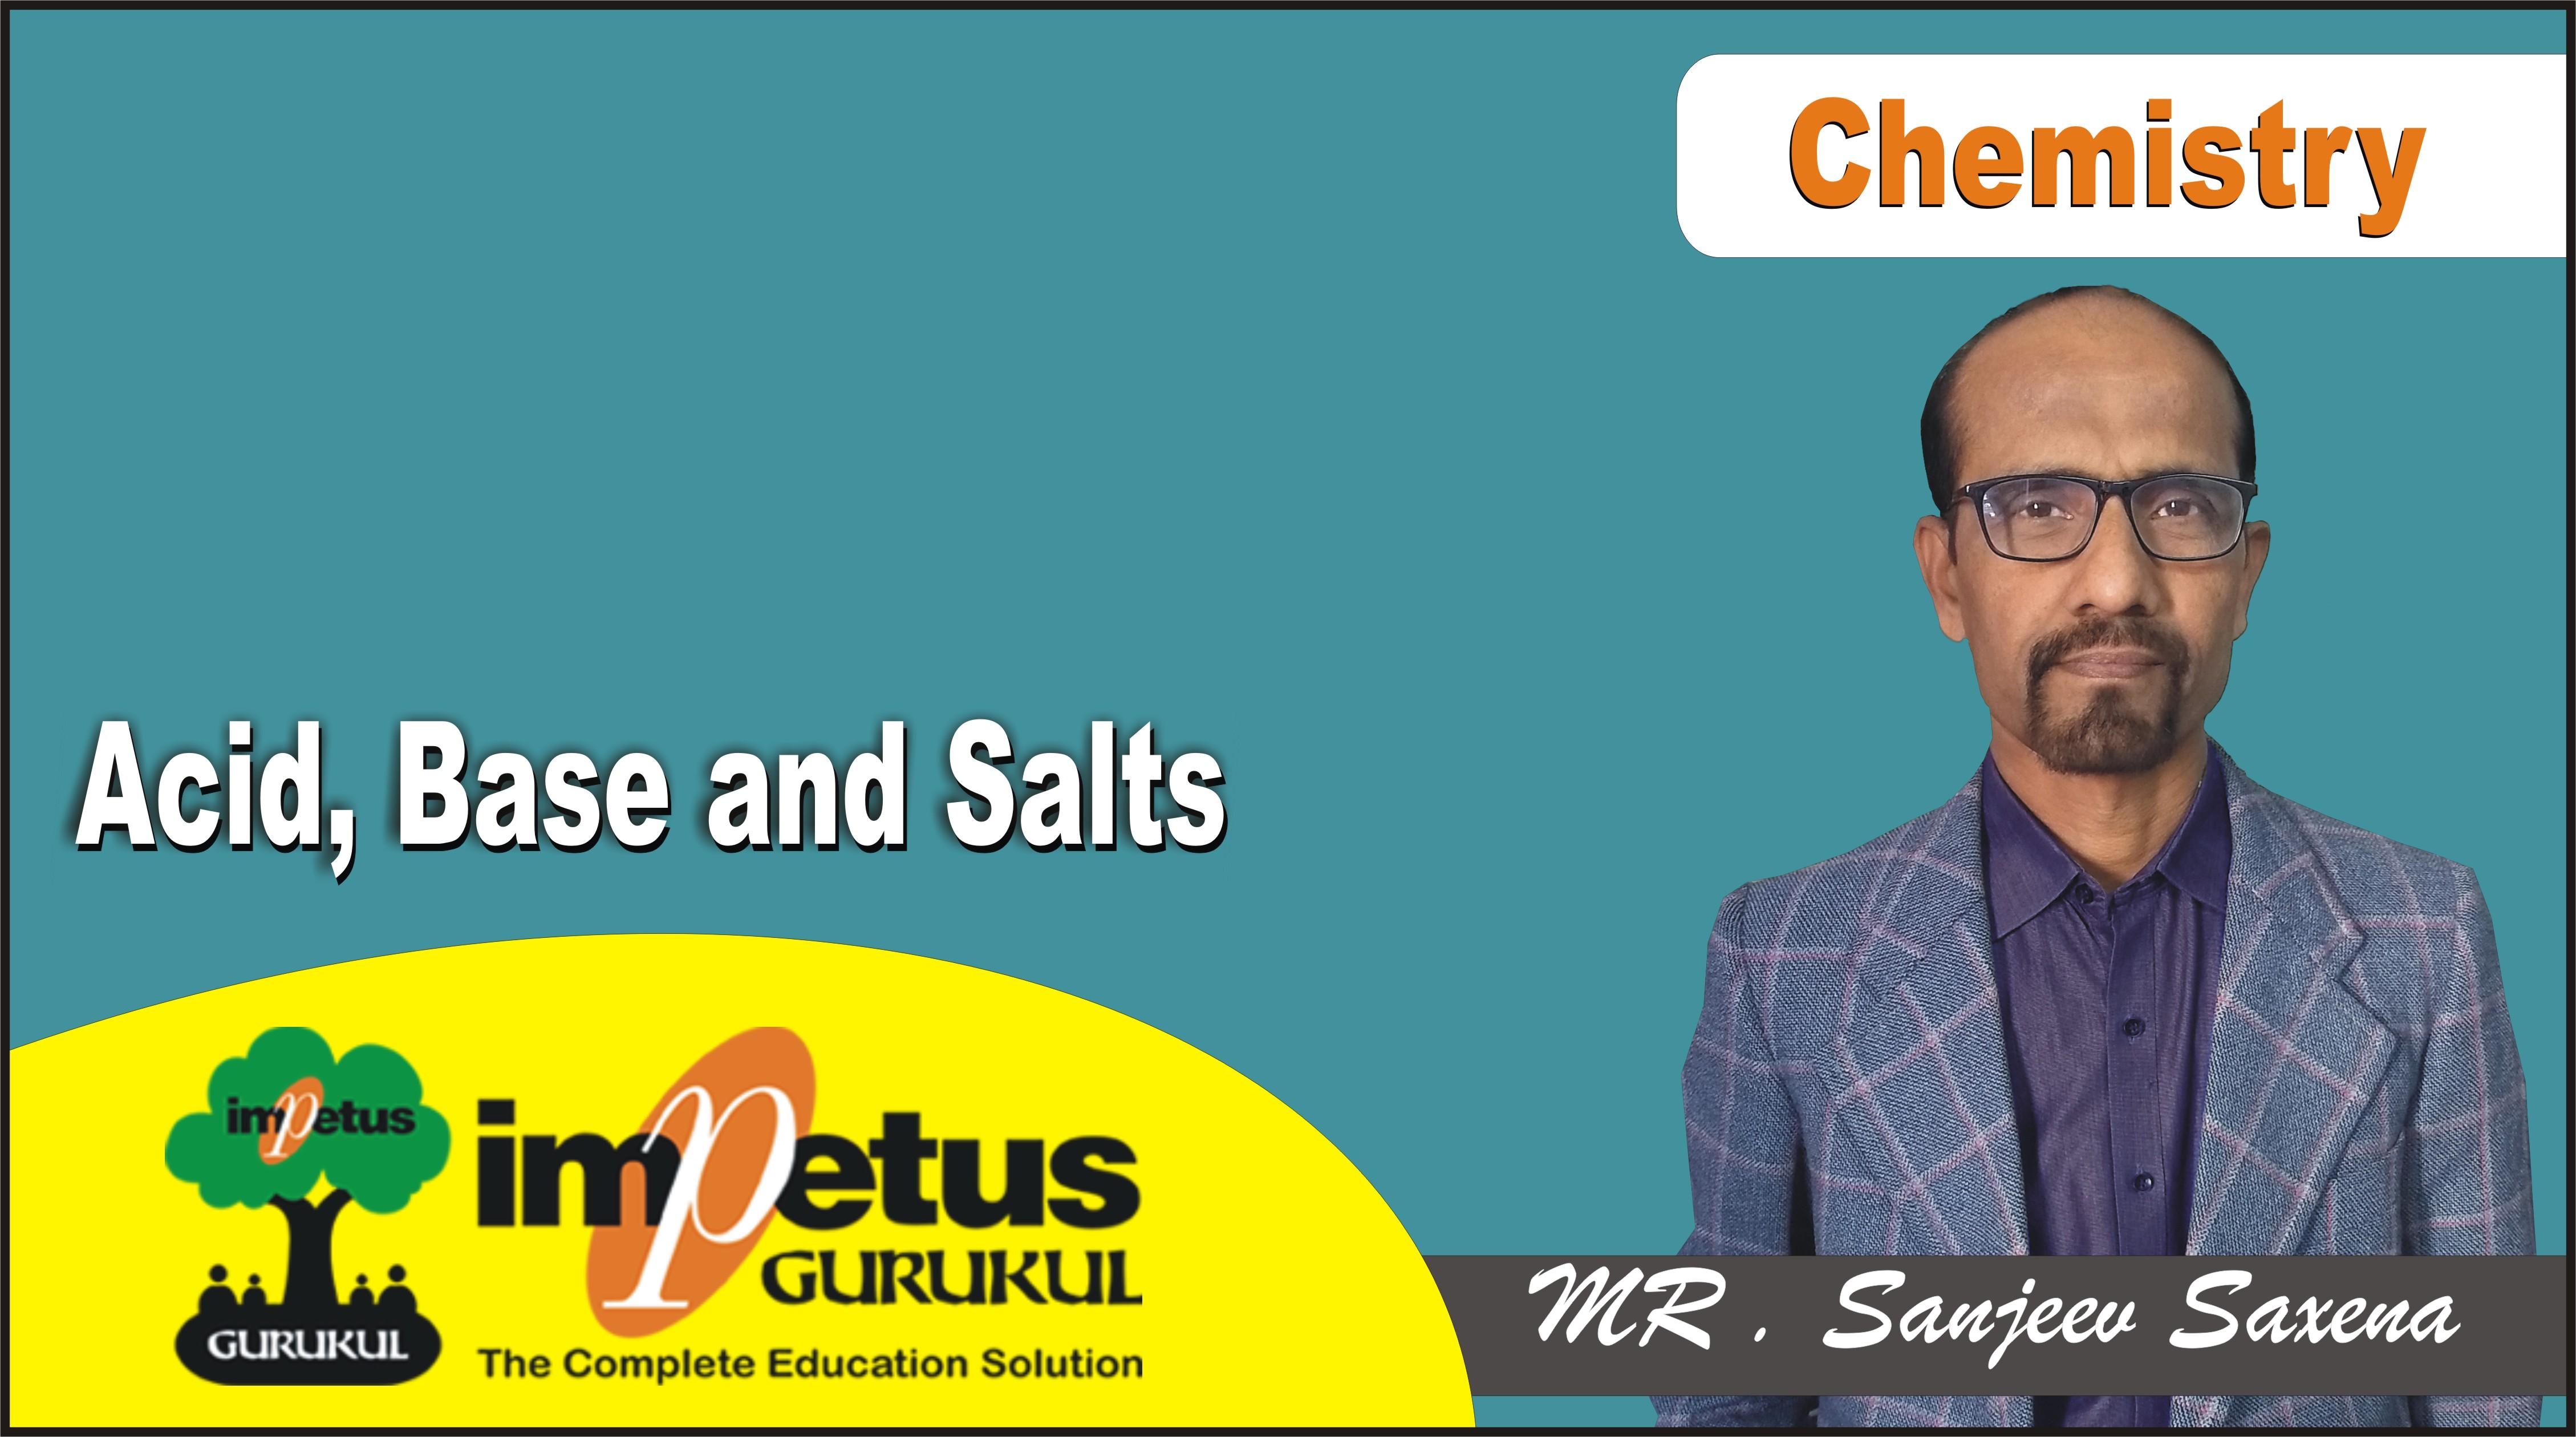 Acid, Base and Salts